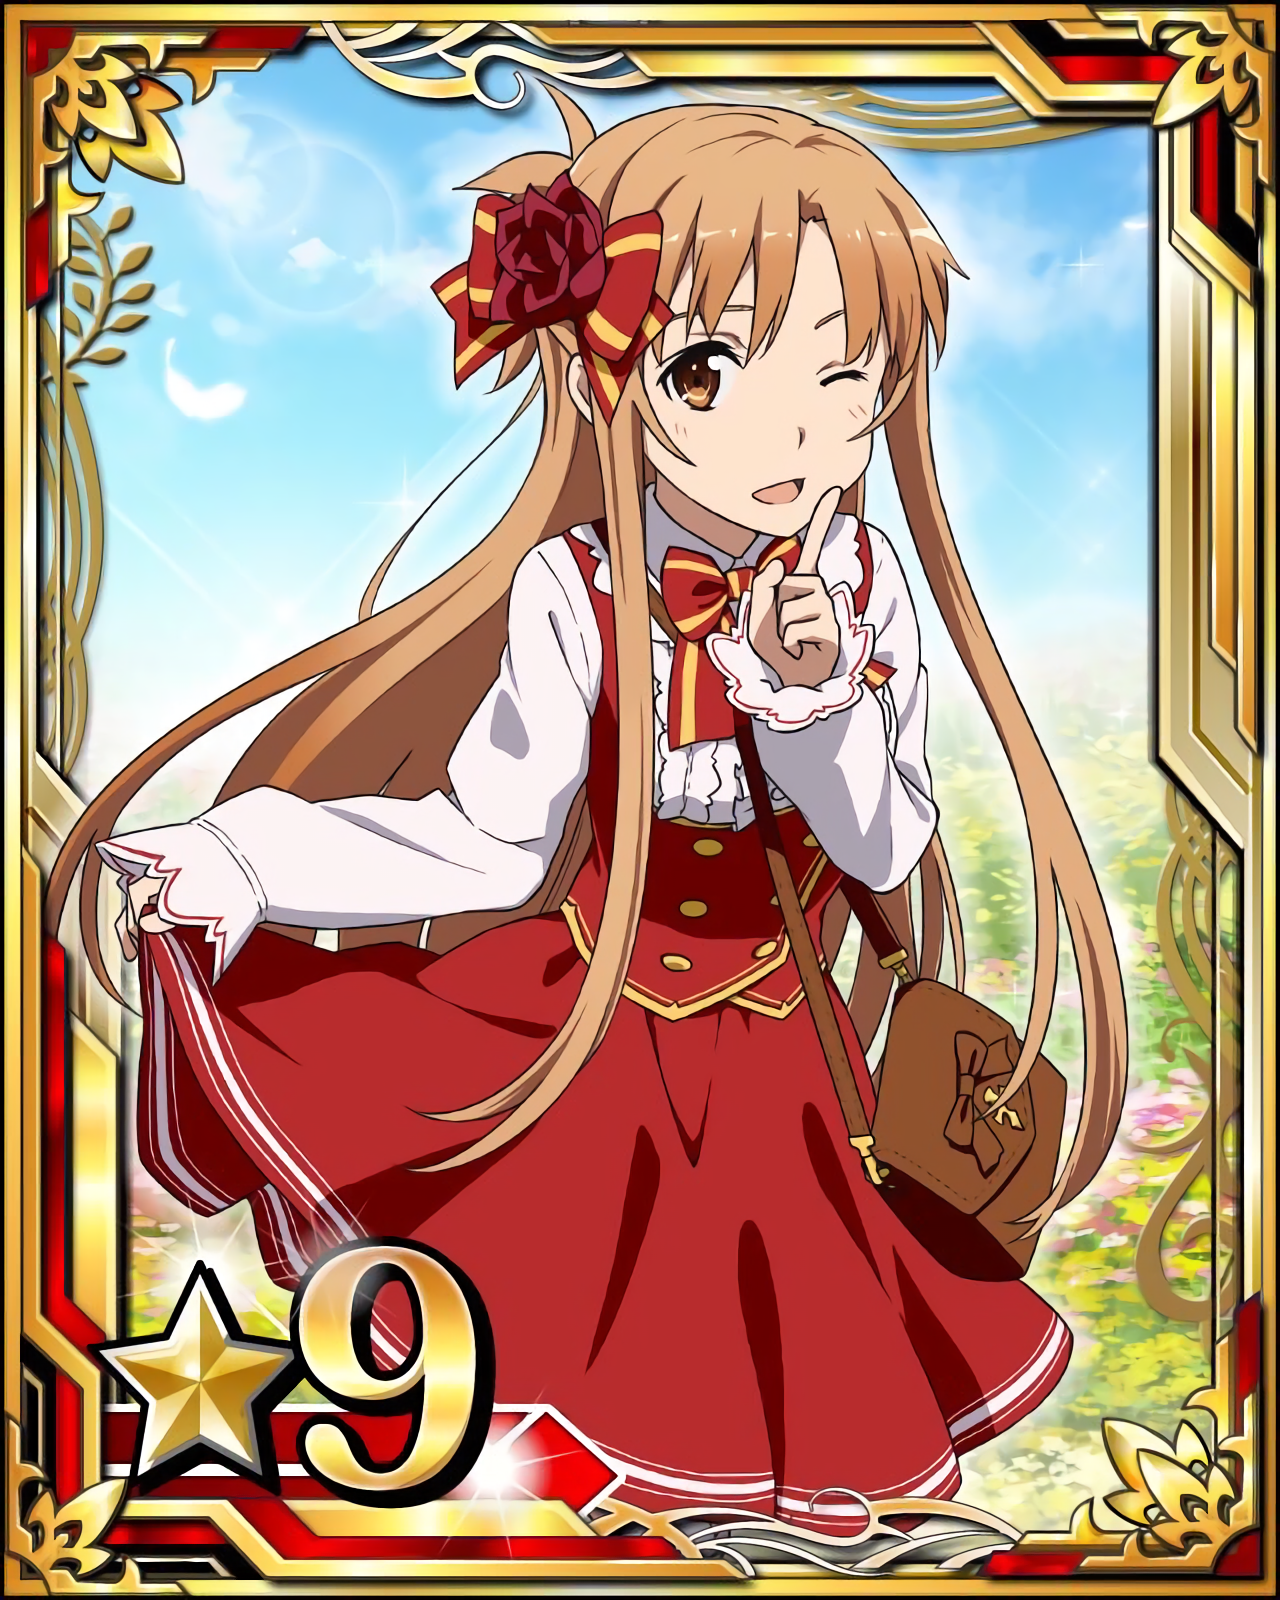 Sword Art Online Asuna Yuuki C & a